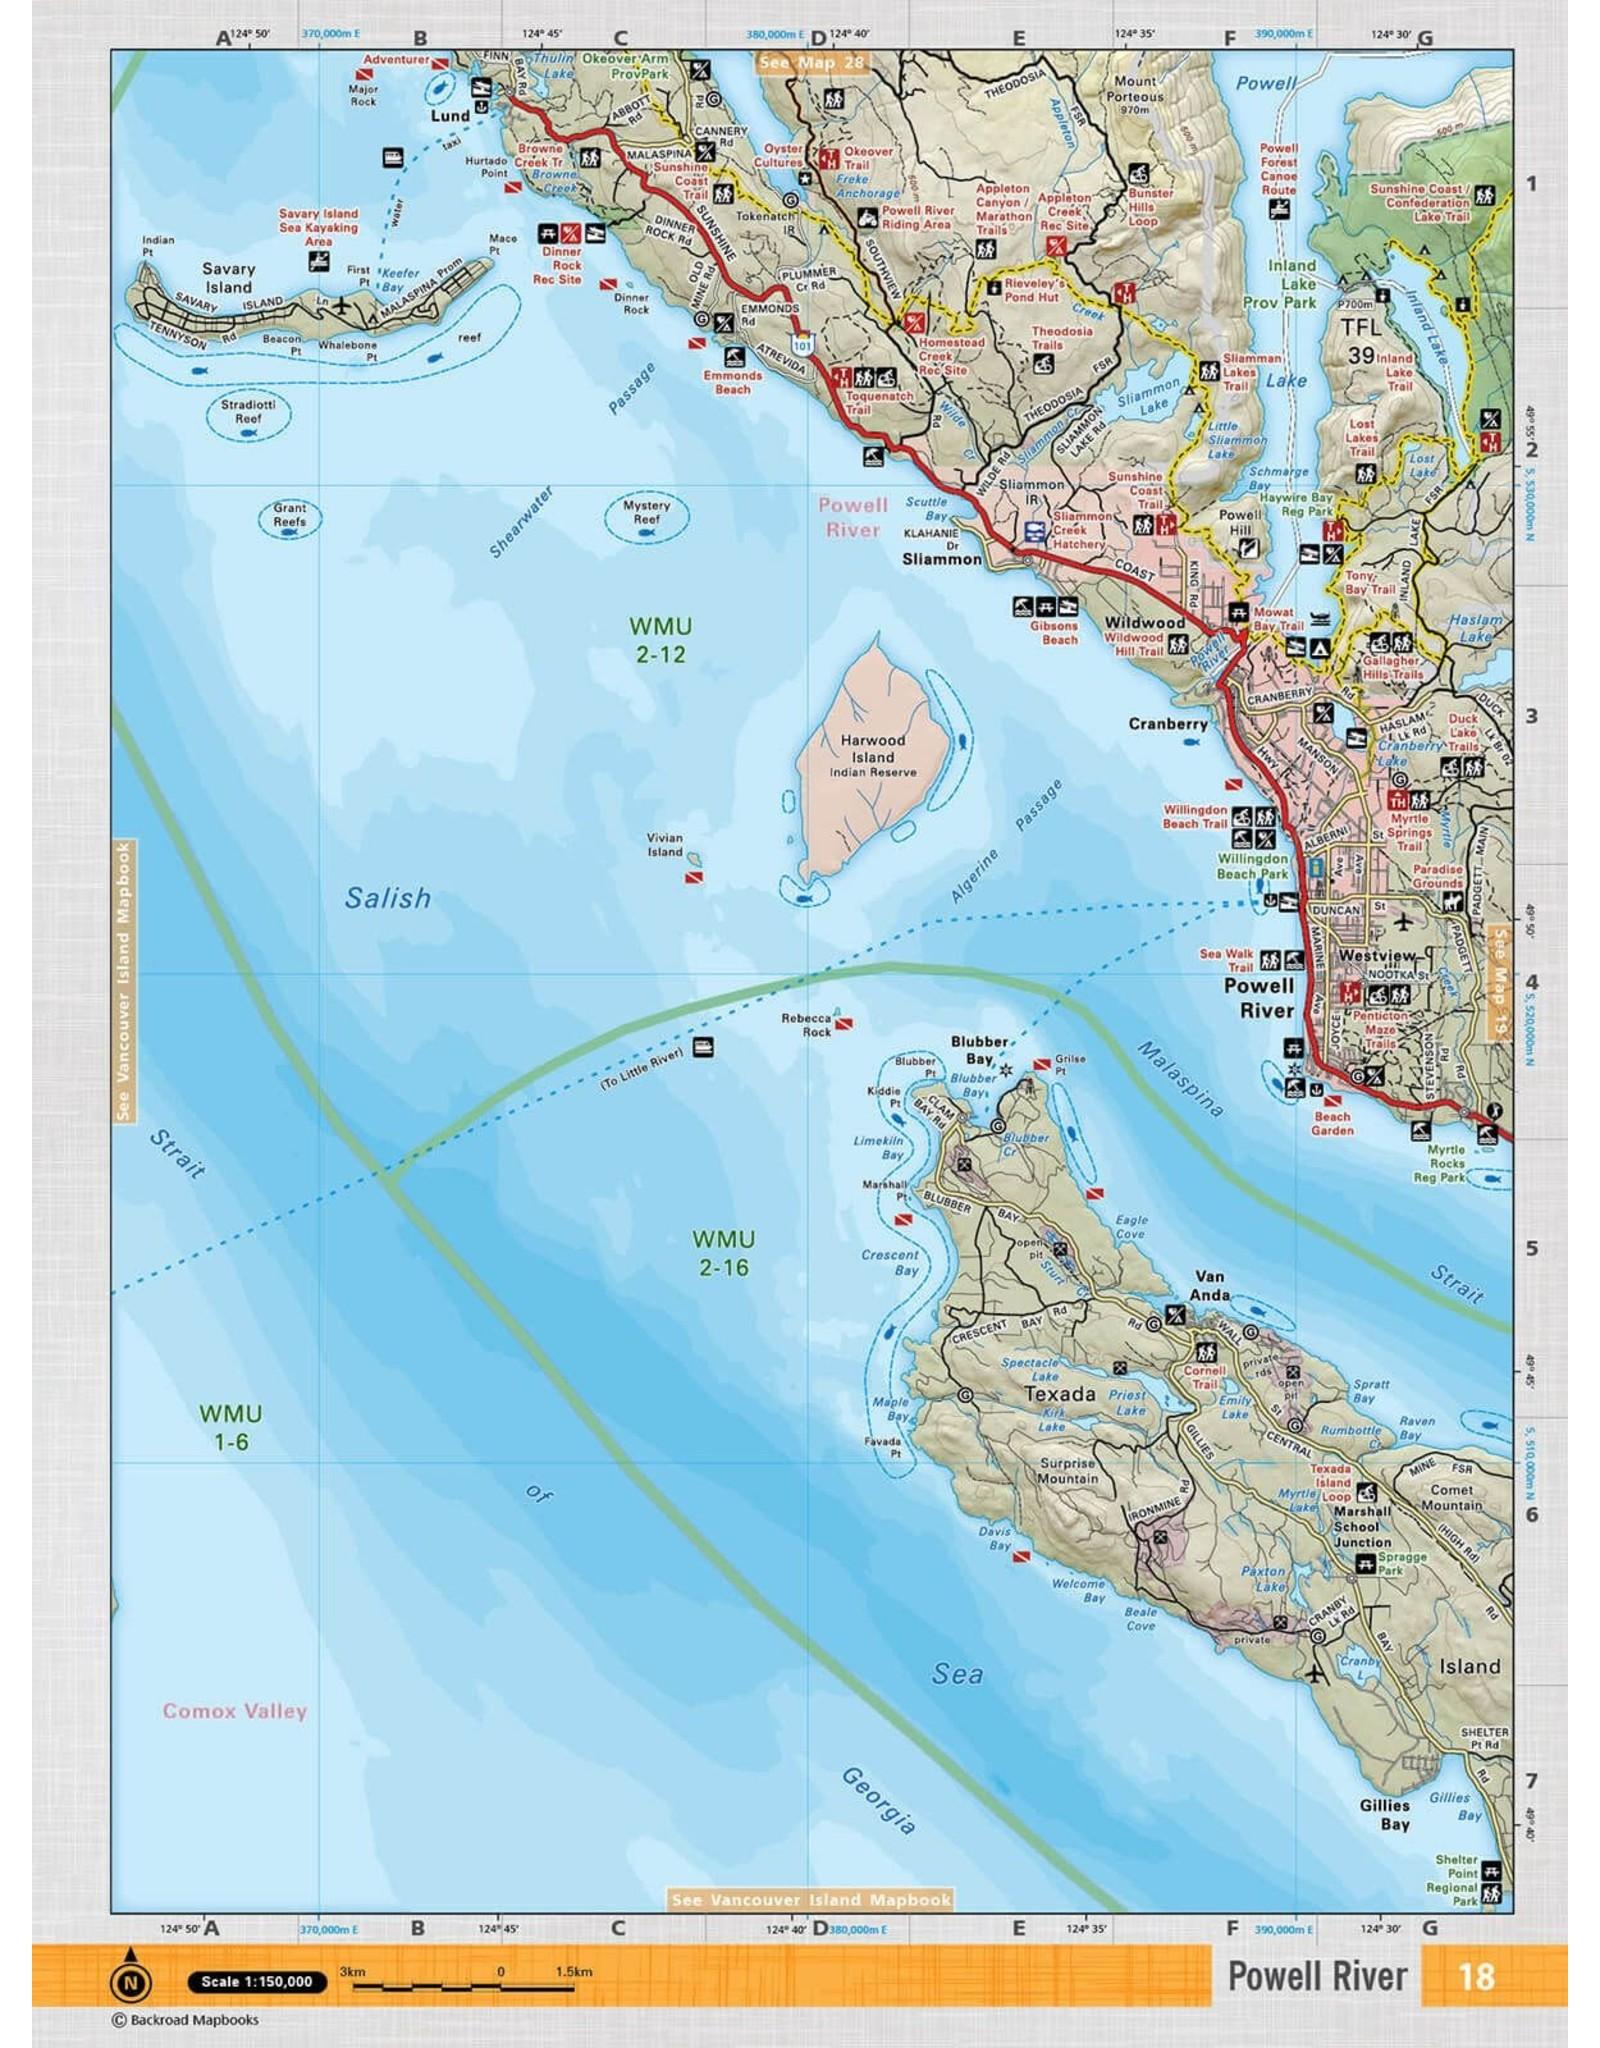 BACKROAD MAPBOOKS BRMB - TOPO MAP (VCBC 18- POWELL RIVER)